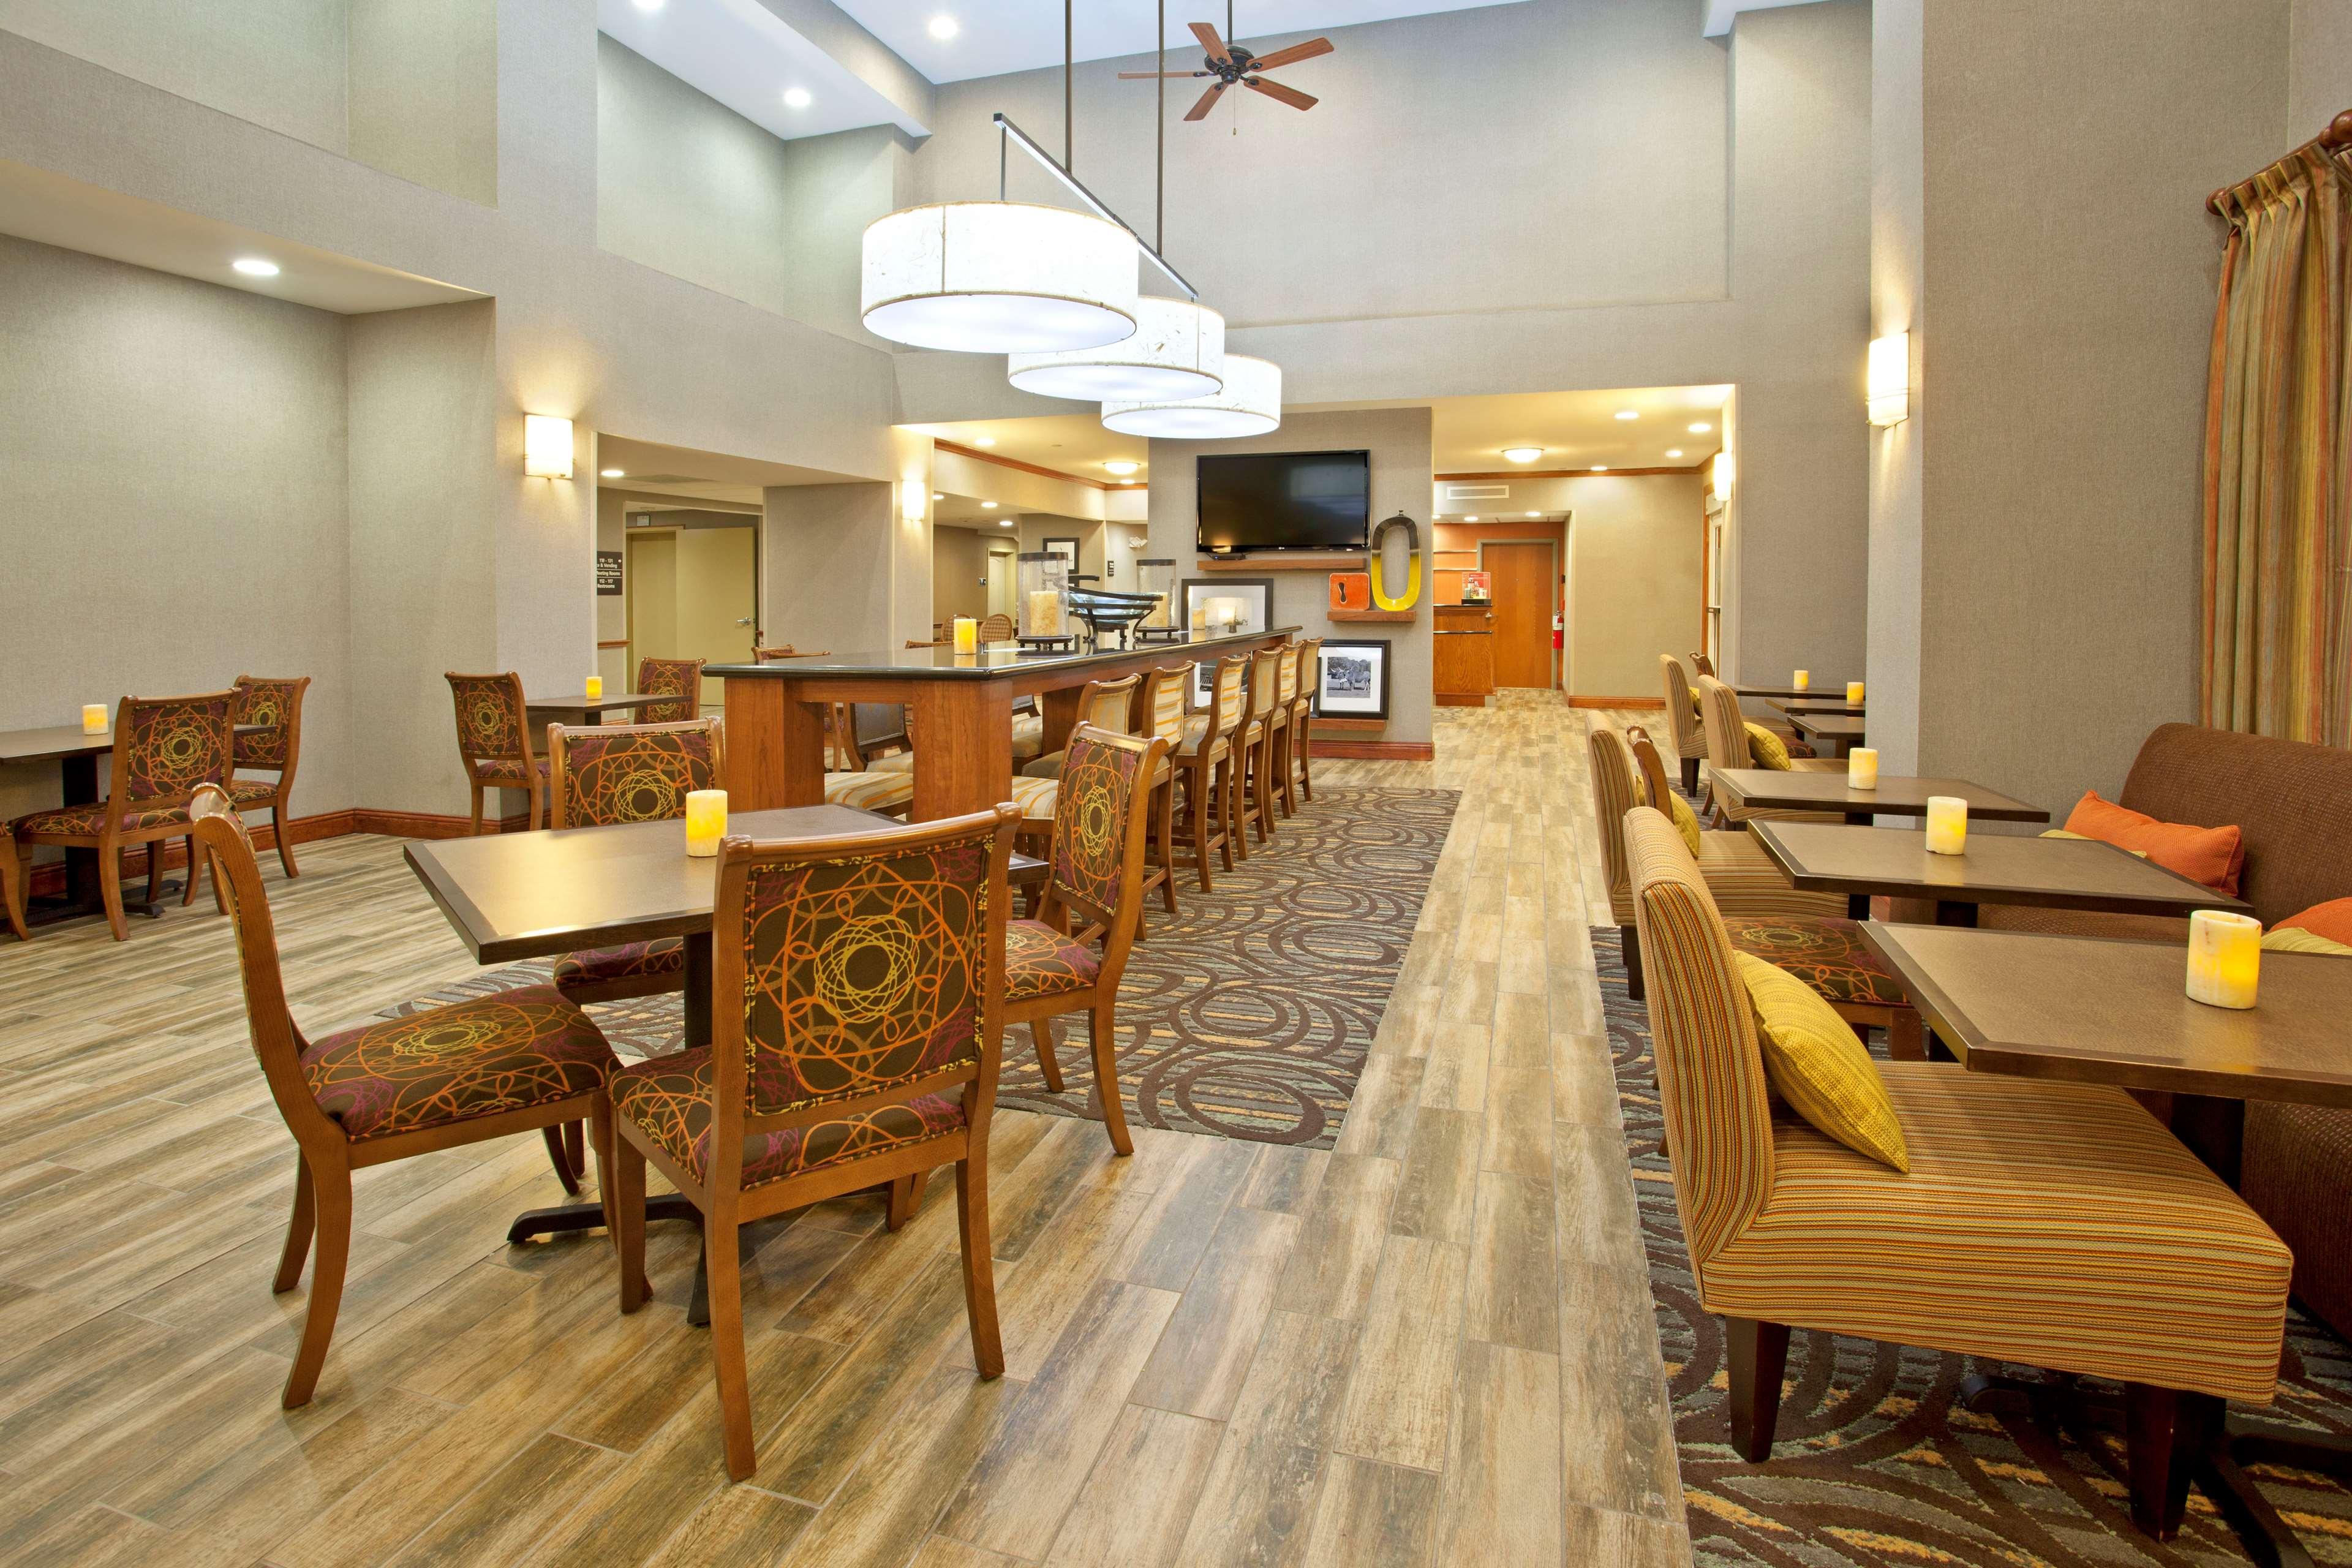 Hampton Inn & Suites Fort Worth-West-I-30 image 8